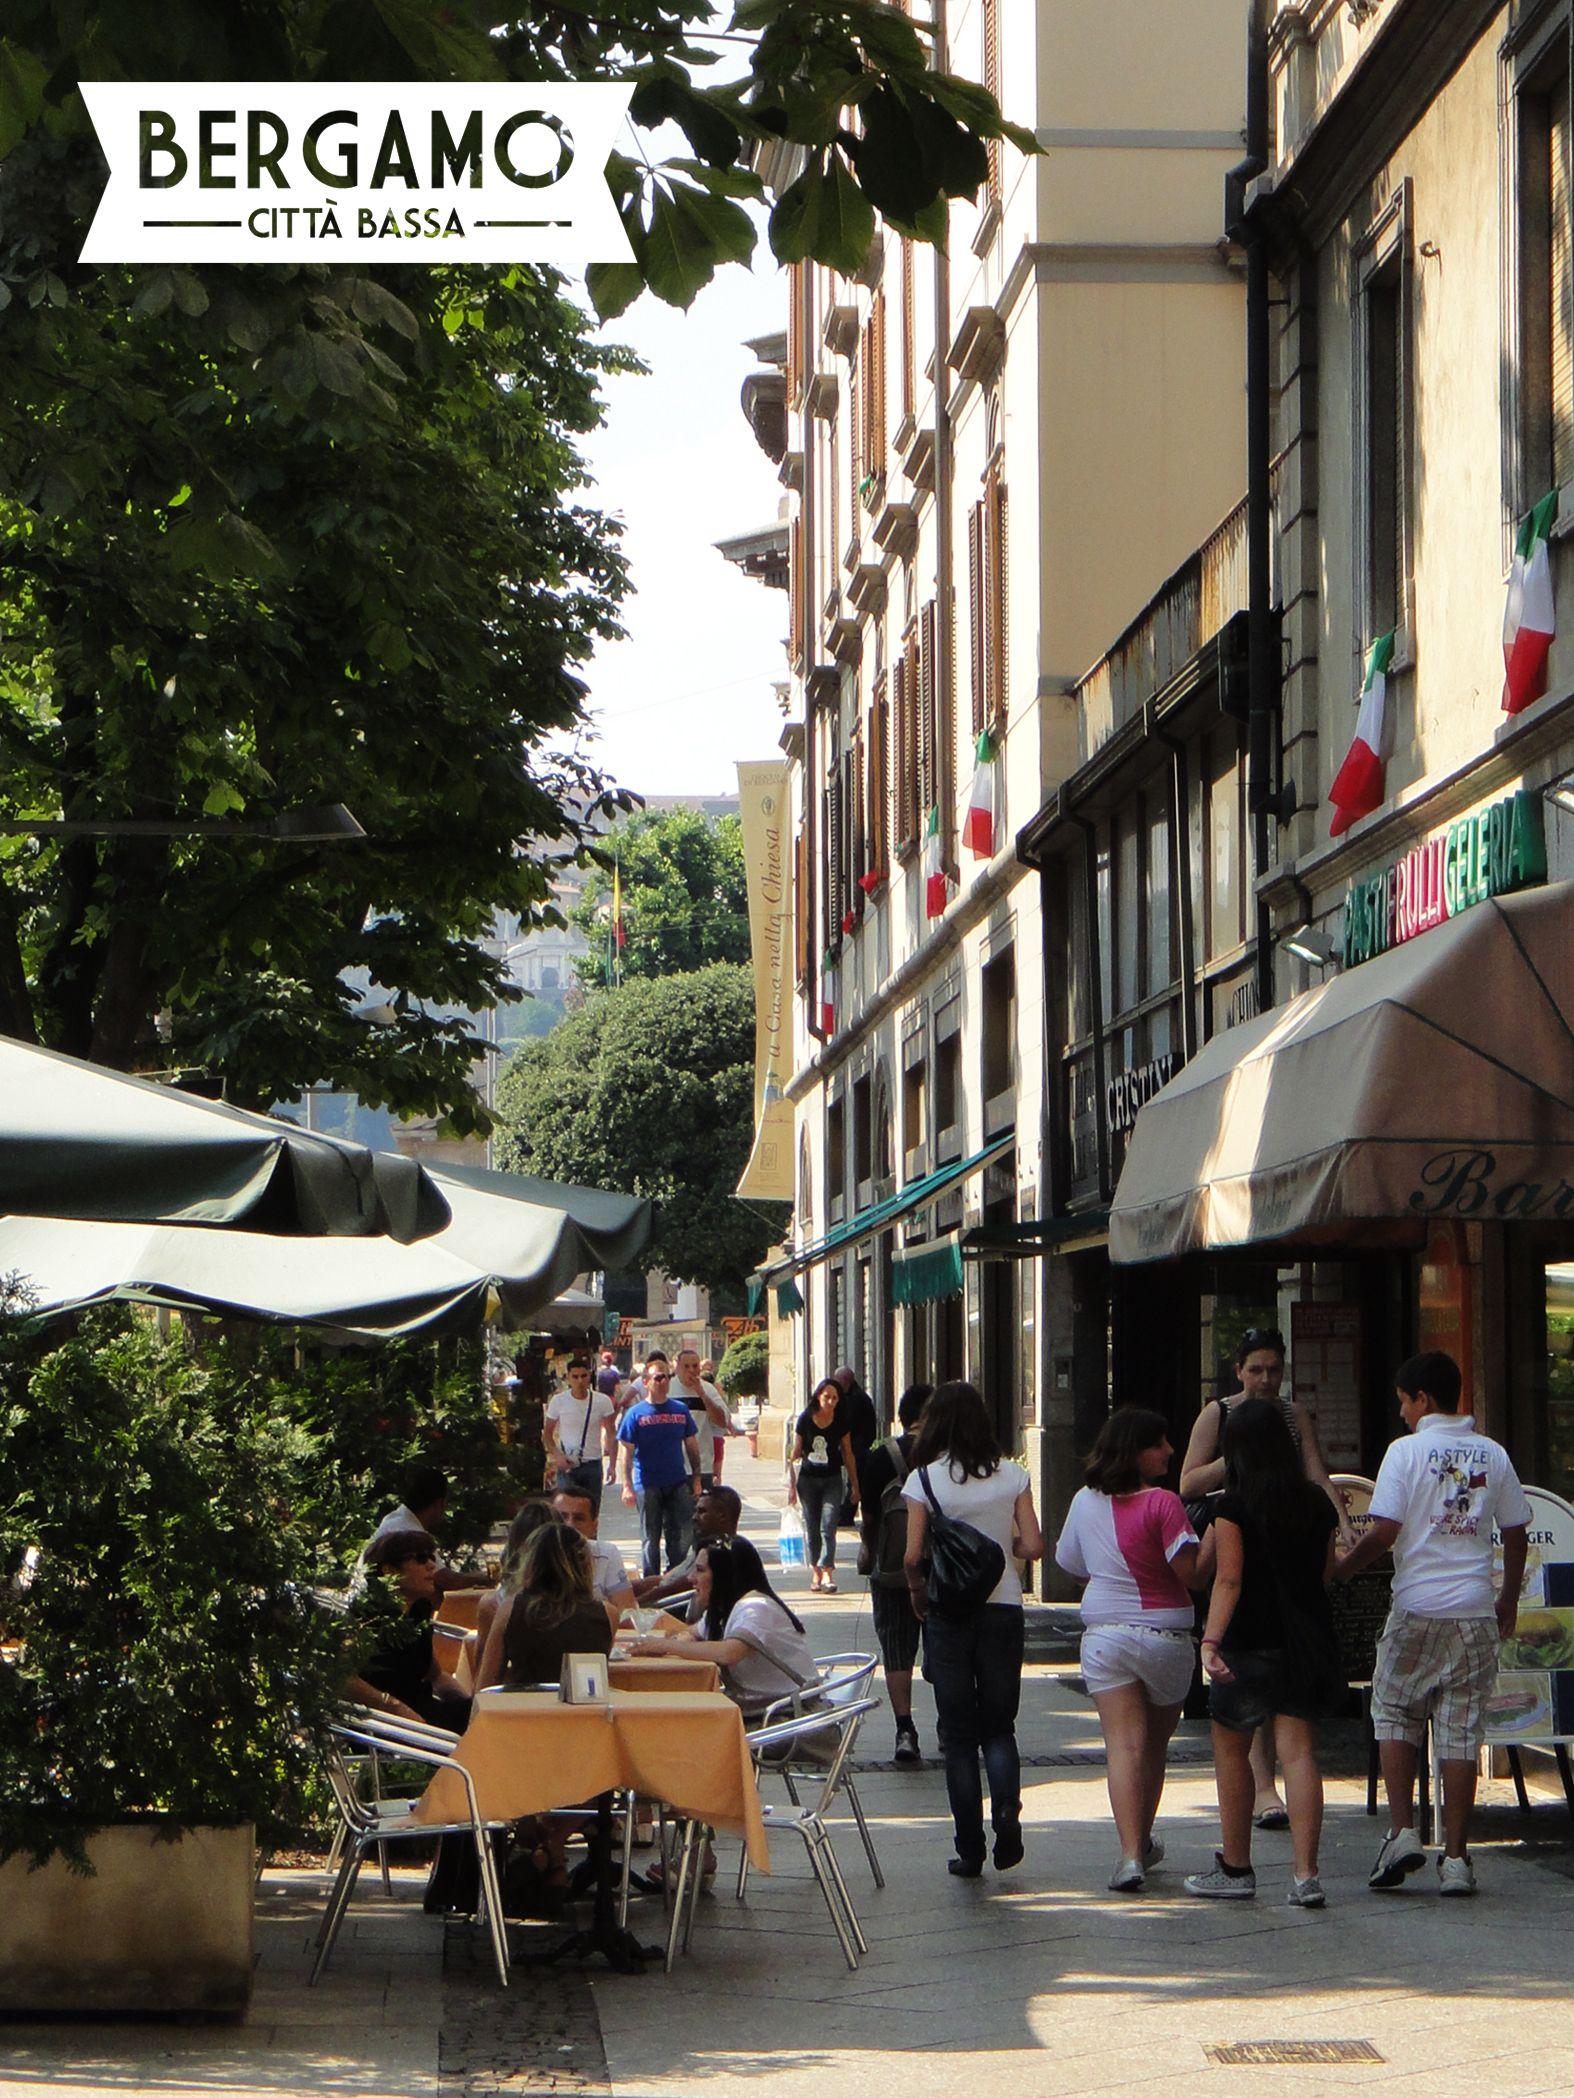 The main street in Città Bassa, Viale Papa Giovanni XXIII. It stretches from the train station up to Porta Nuova, the funicolare, and Città Alta.